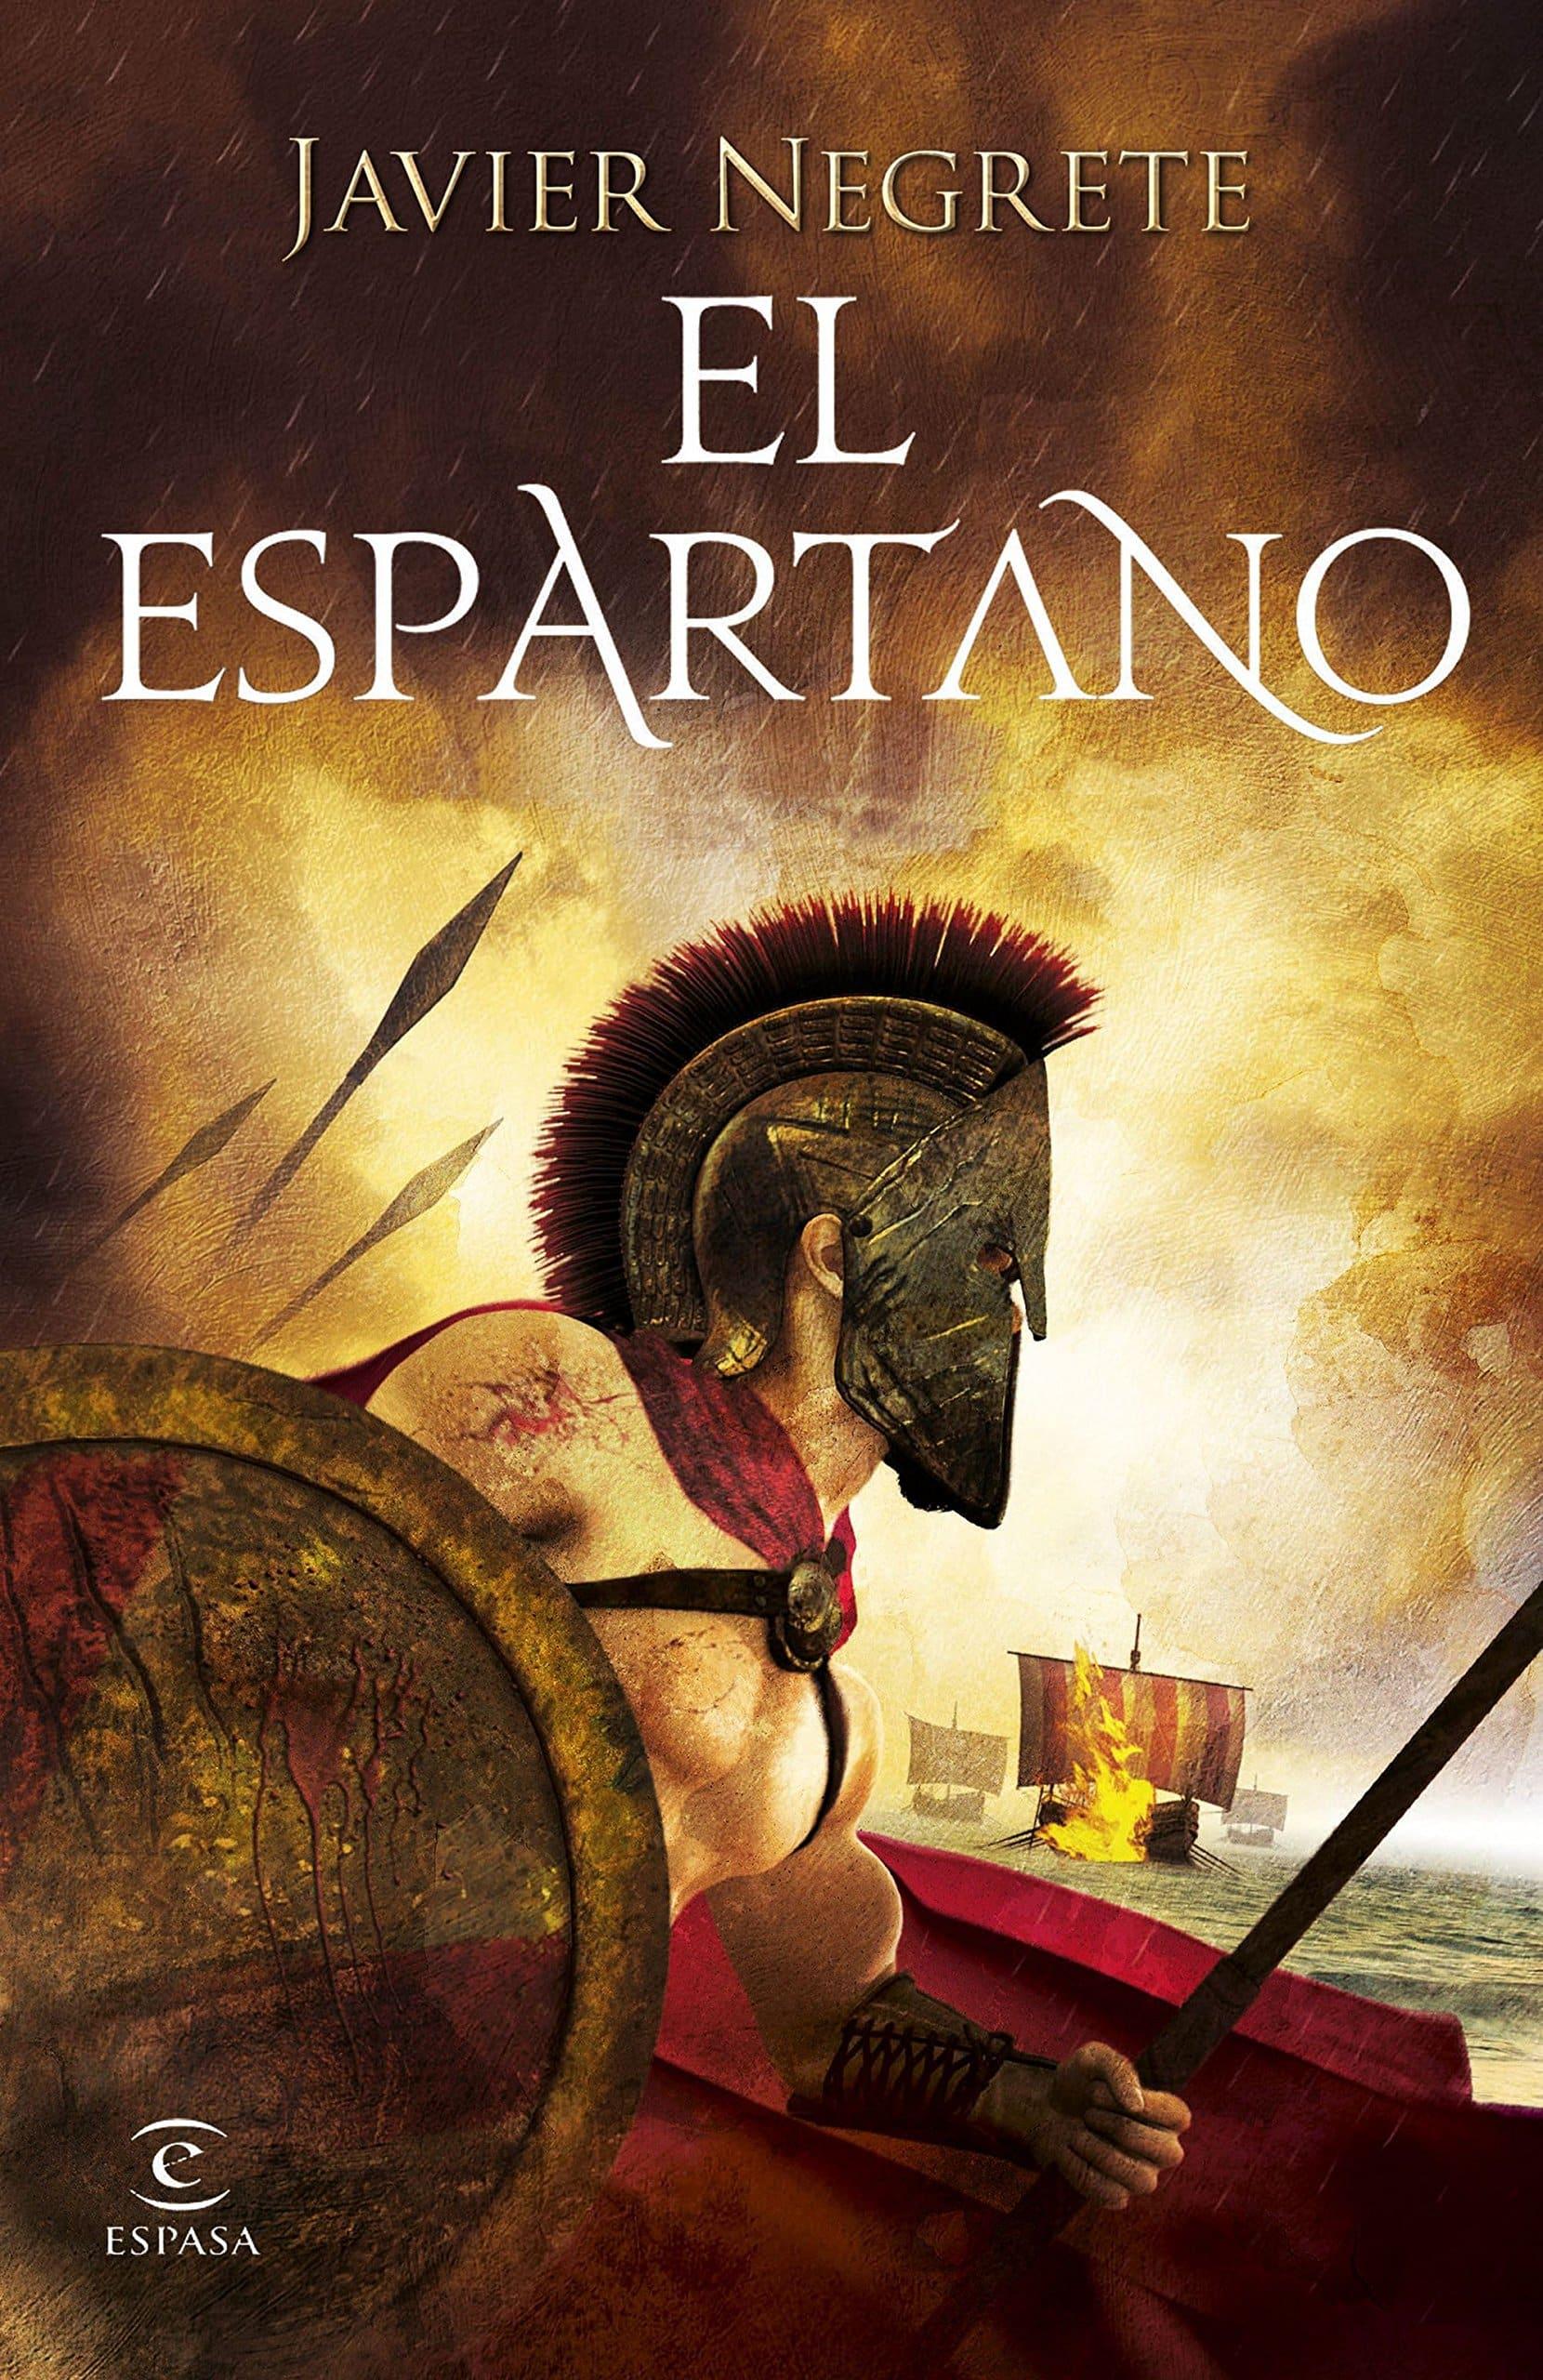 javier negrete el espartano